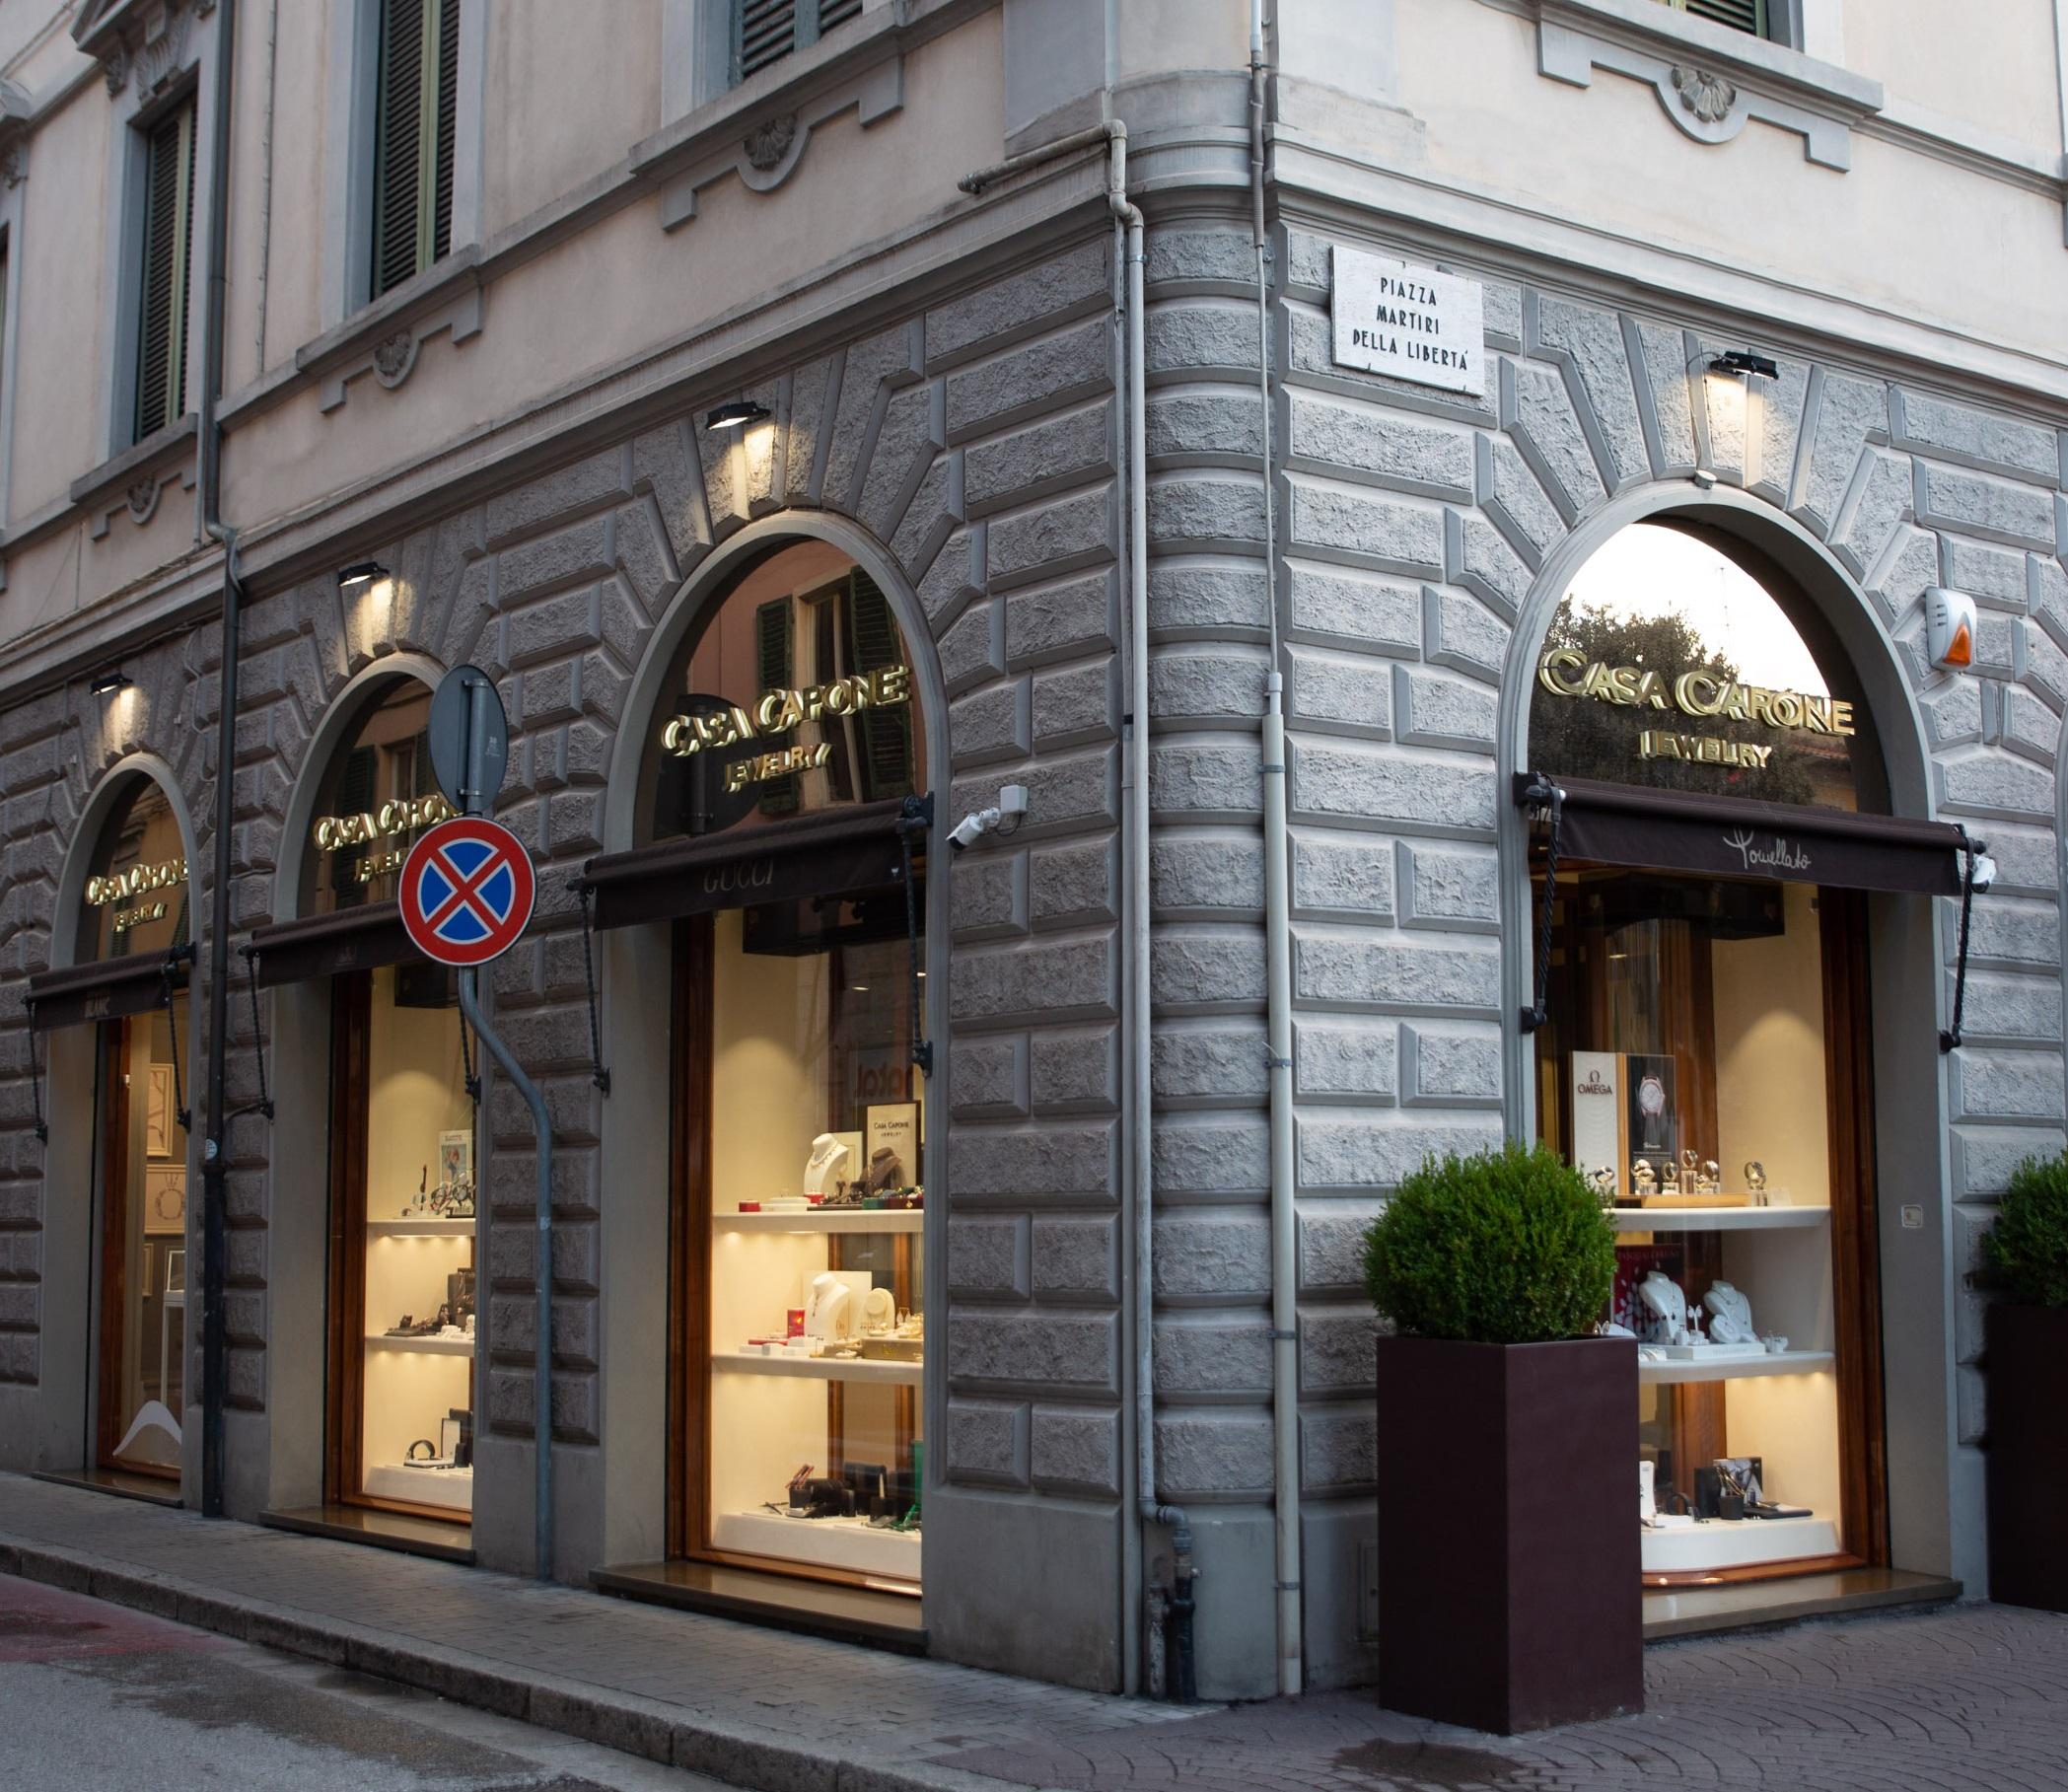 Casa Capone Jewelry - Pontedera